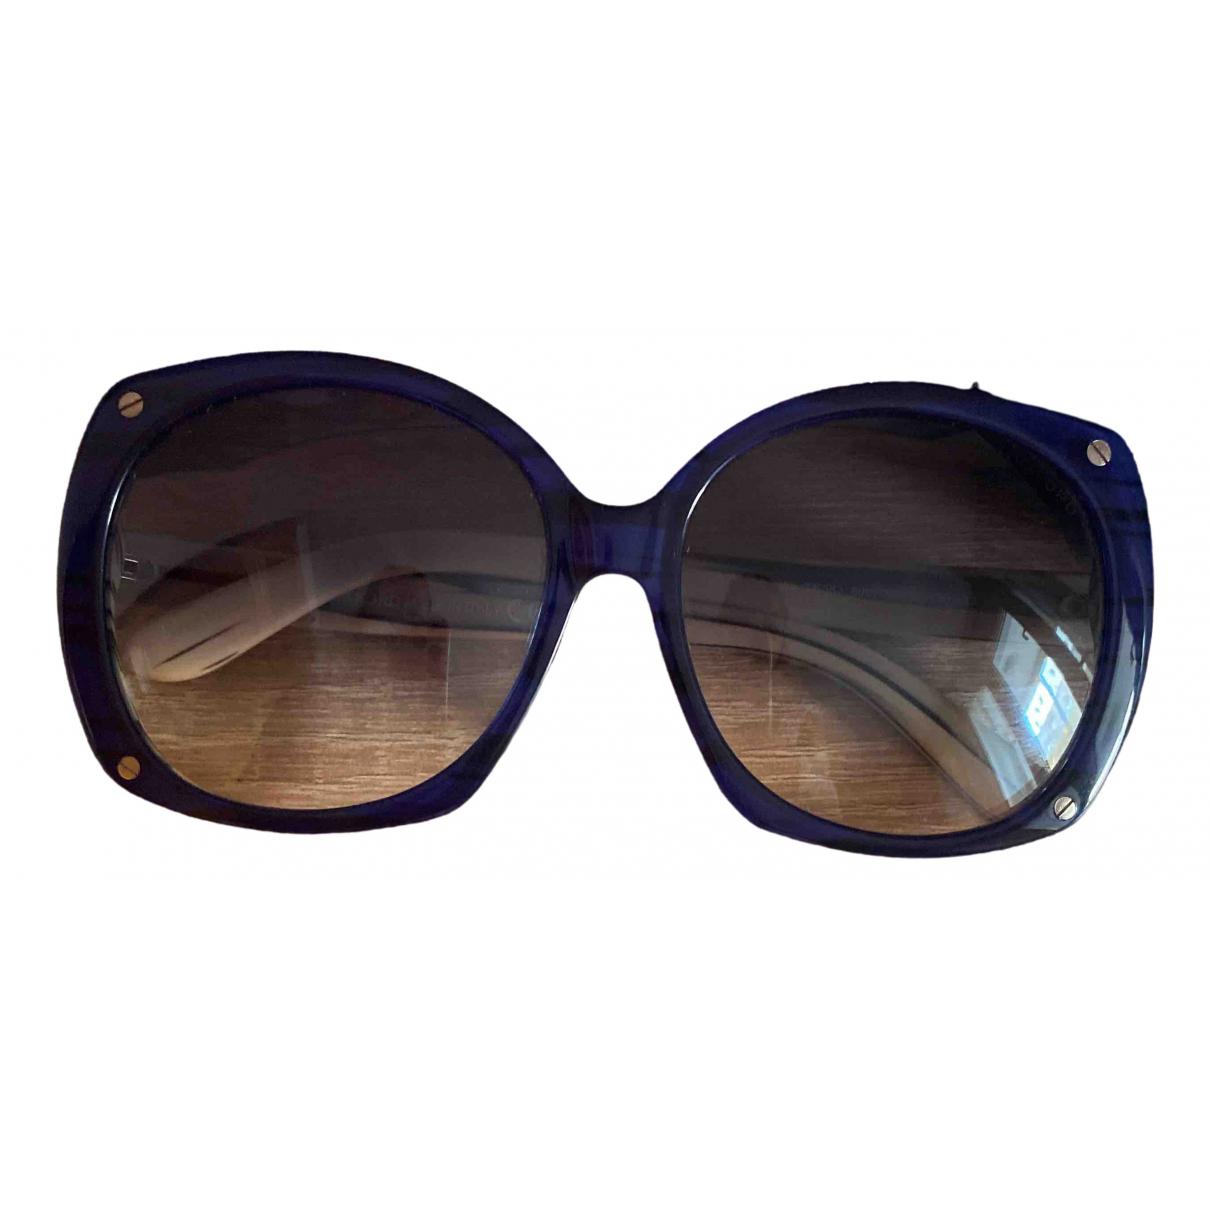 Tom Ford - Lunettes   pour femme - bleu